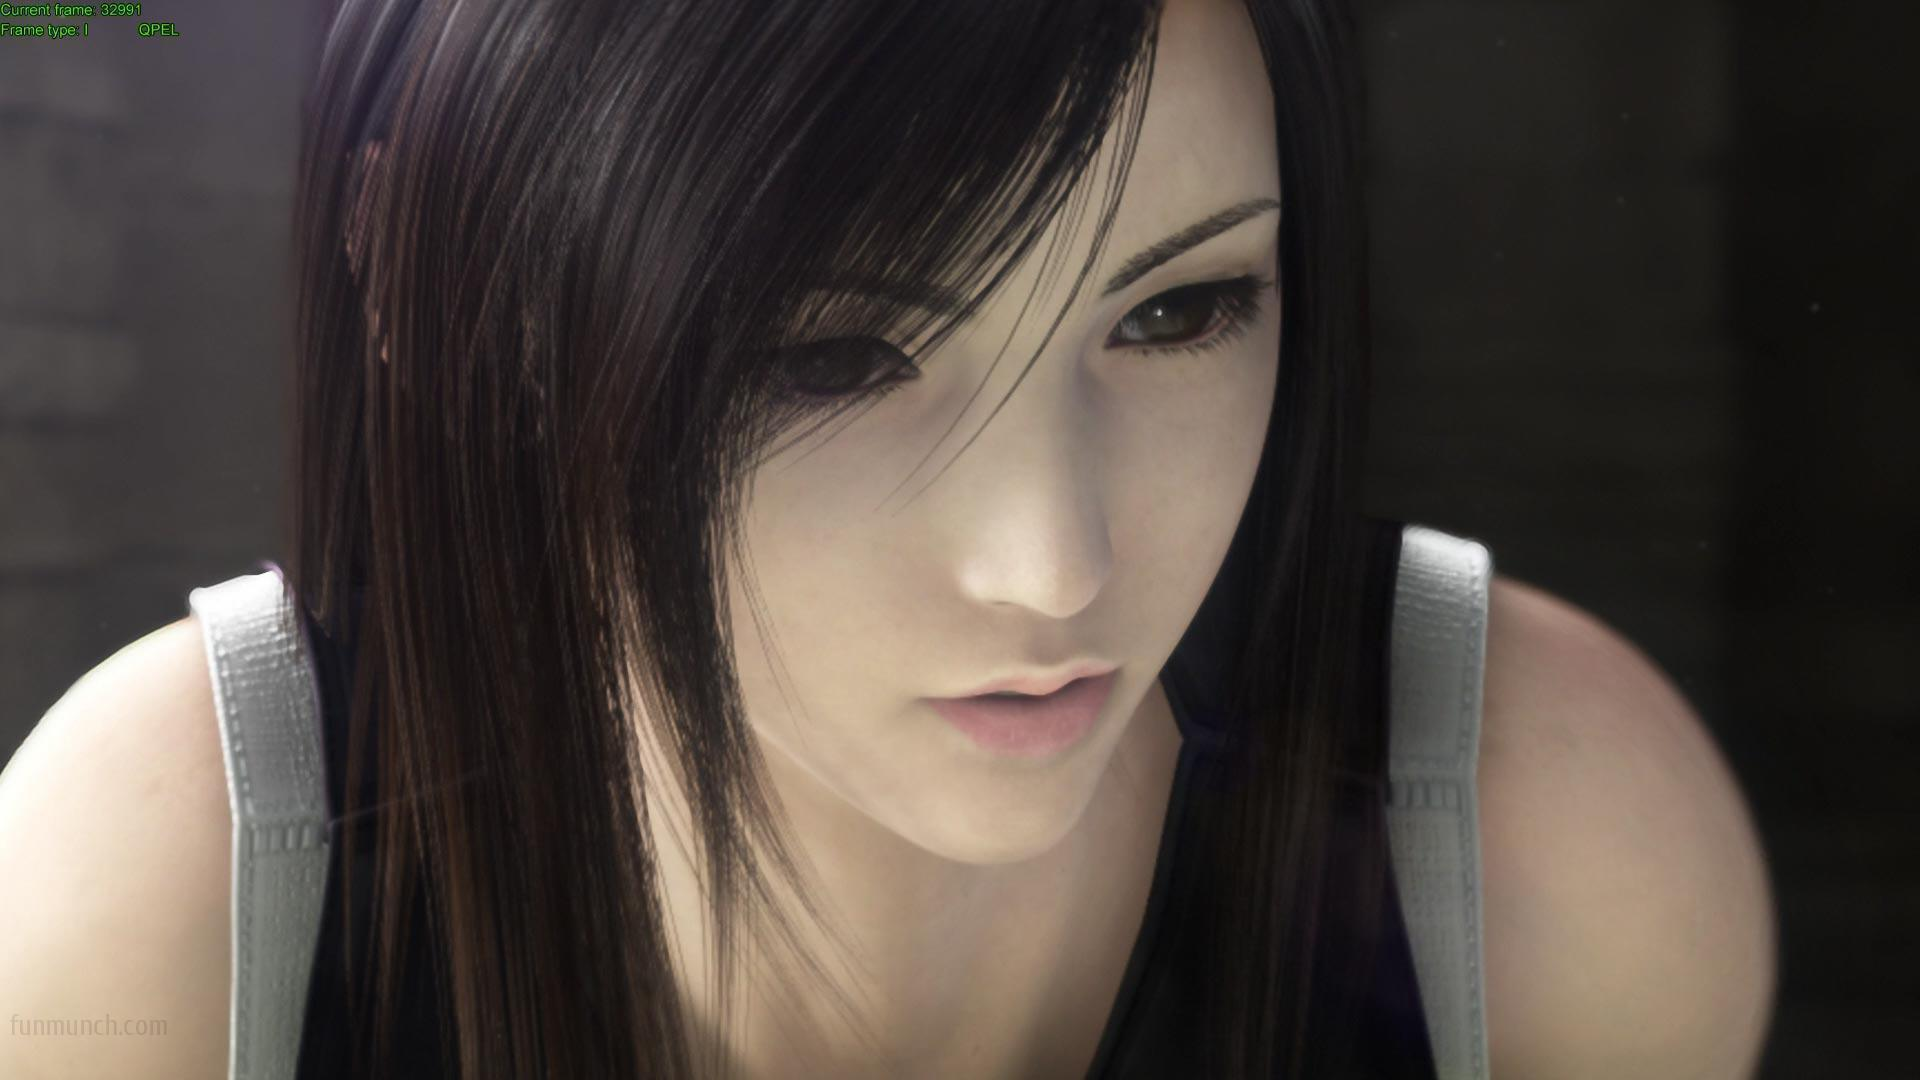 Tifa Lockhart Final Fantasy Artwork Hd Fantasy Girls 4k: Final Fantasy Tifa Wallpapers